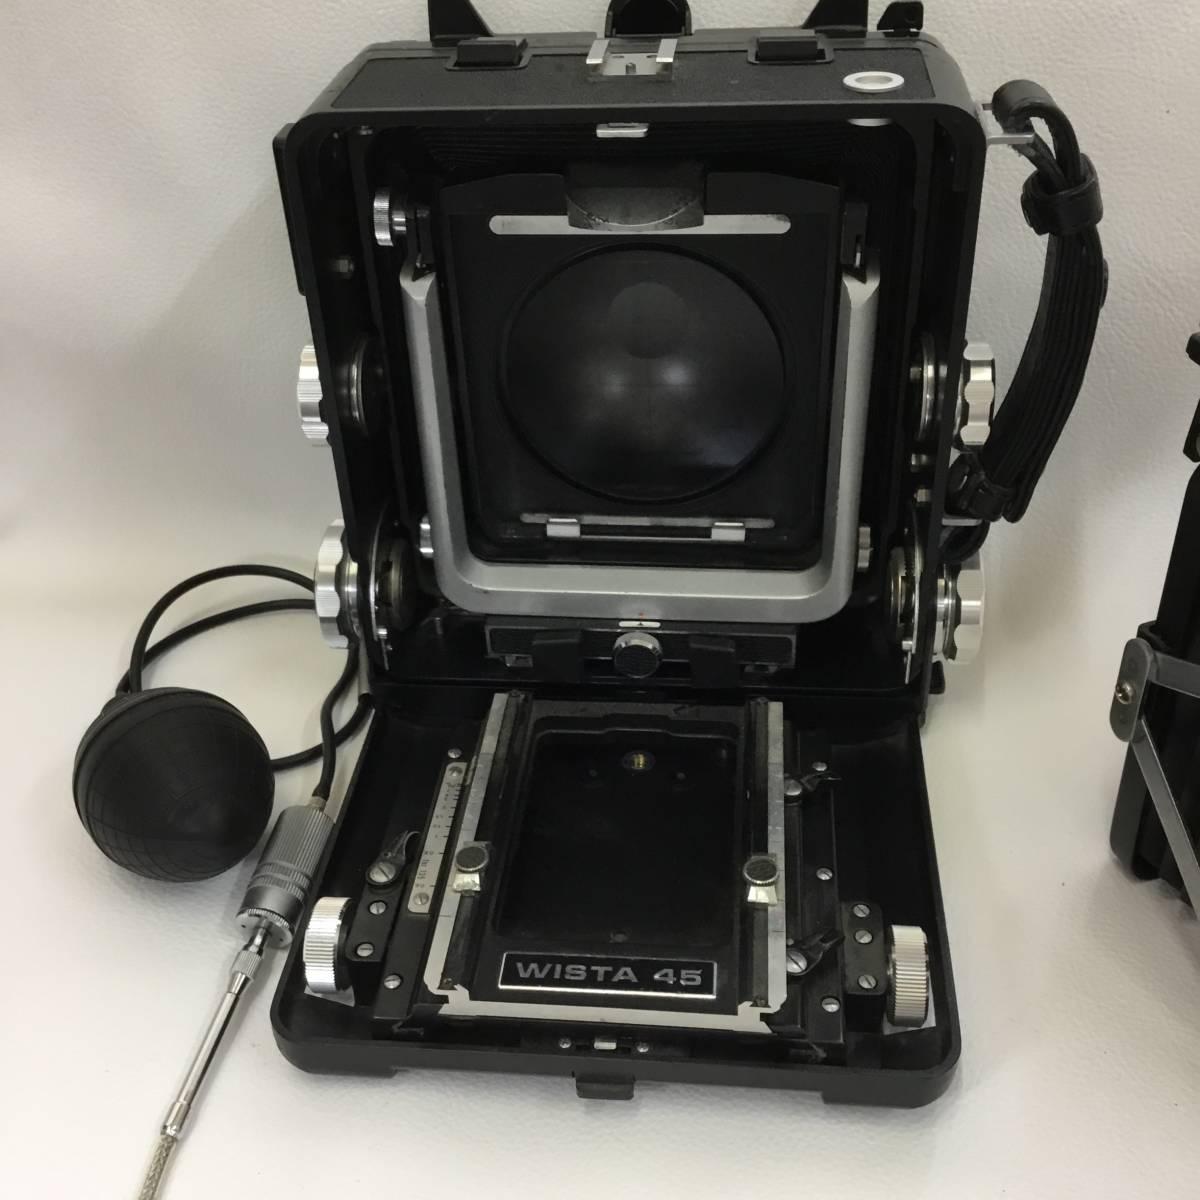 WISTA 45 ウィスタ45 レンズ 付属品セット 大判カメラ_画像7